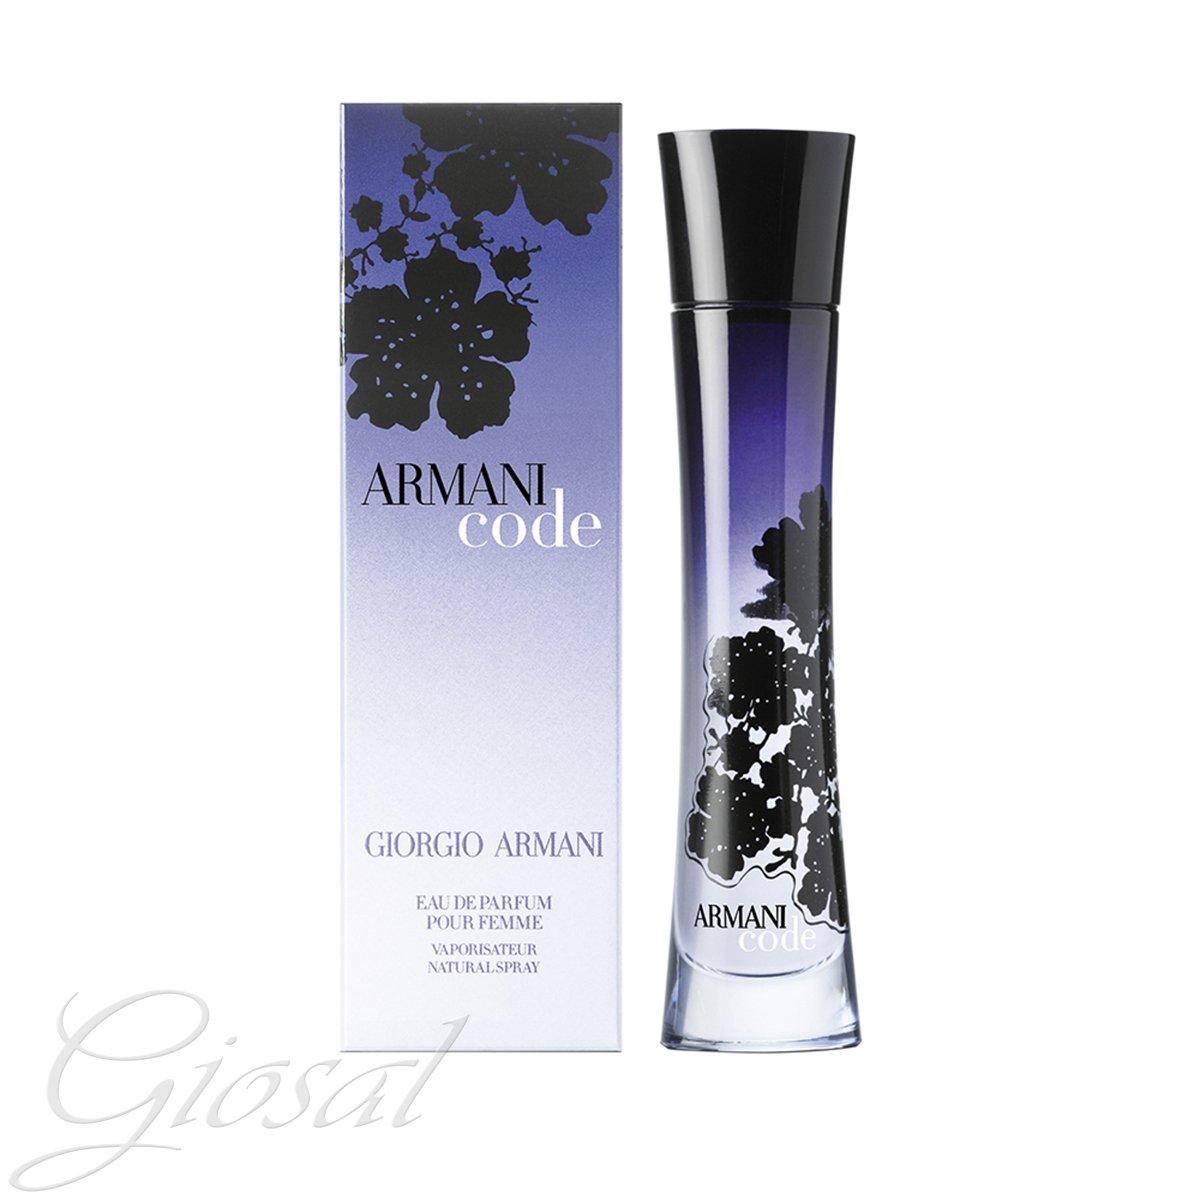 Femme De Armani Code Eau 30 Parfume Giorgio Parfum Ml Féminine Ybgmf76vIy